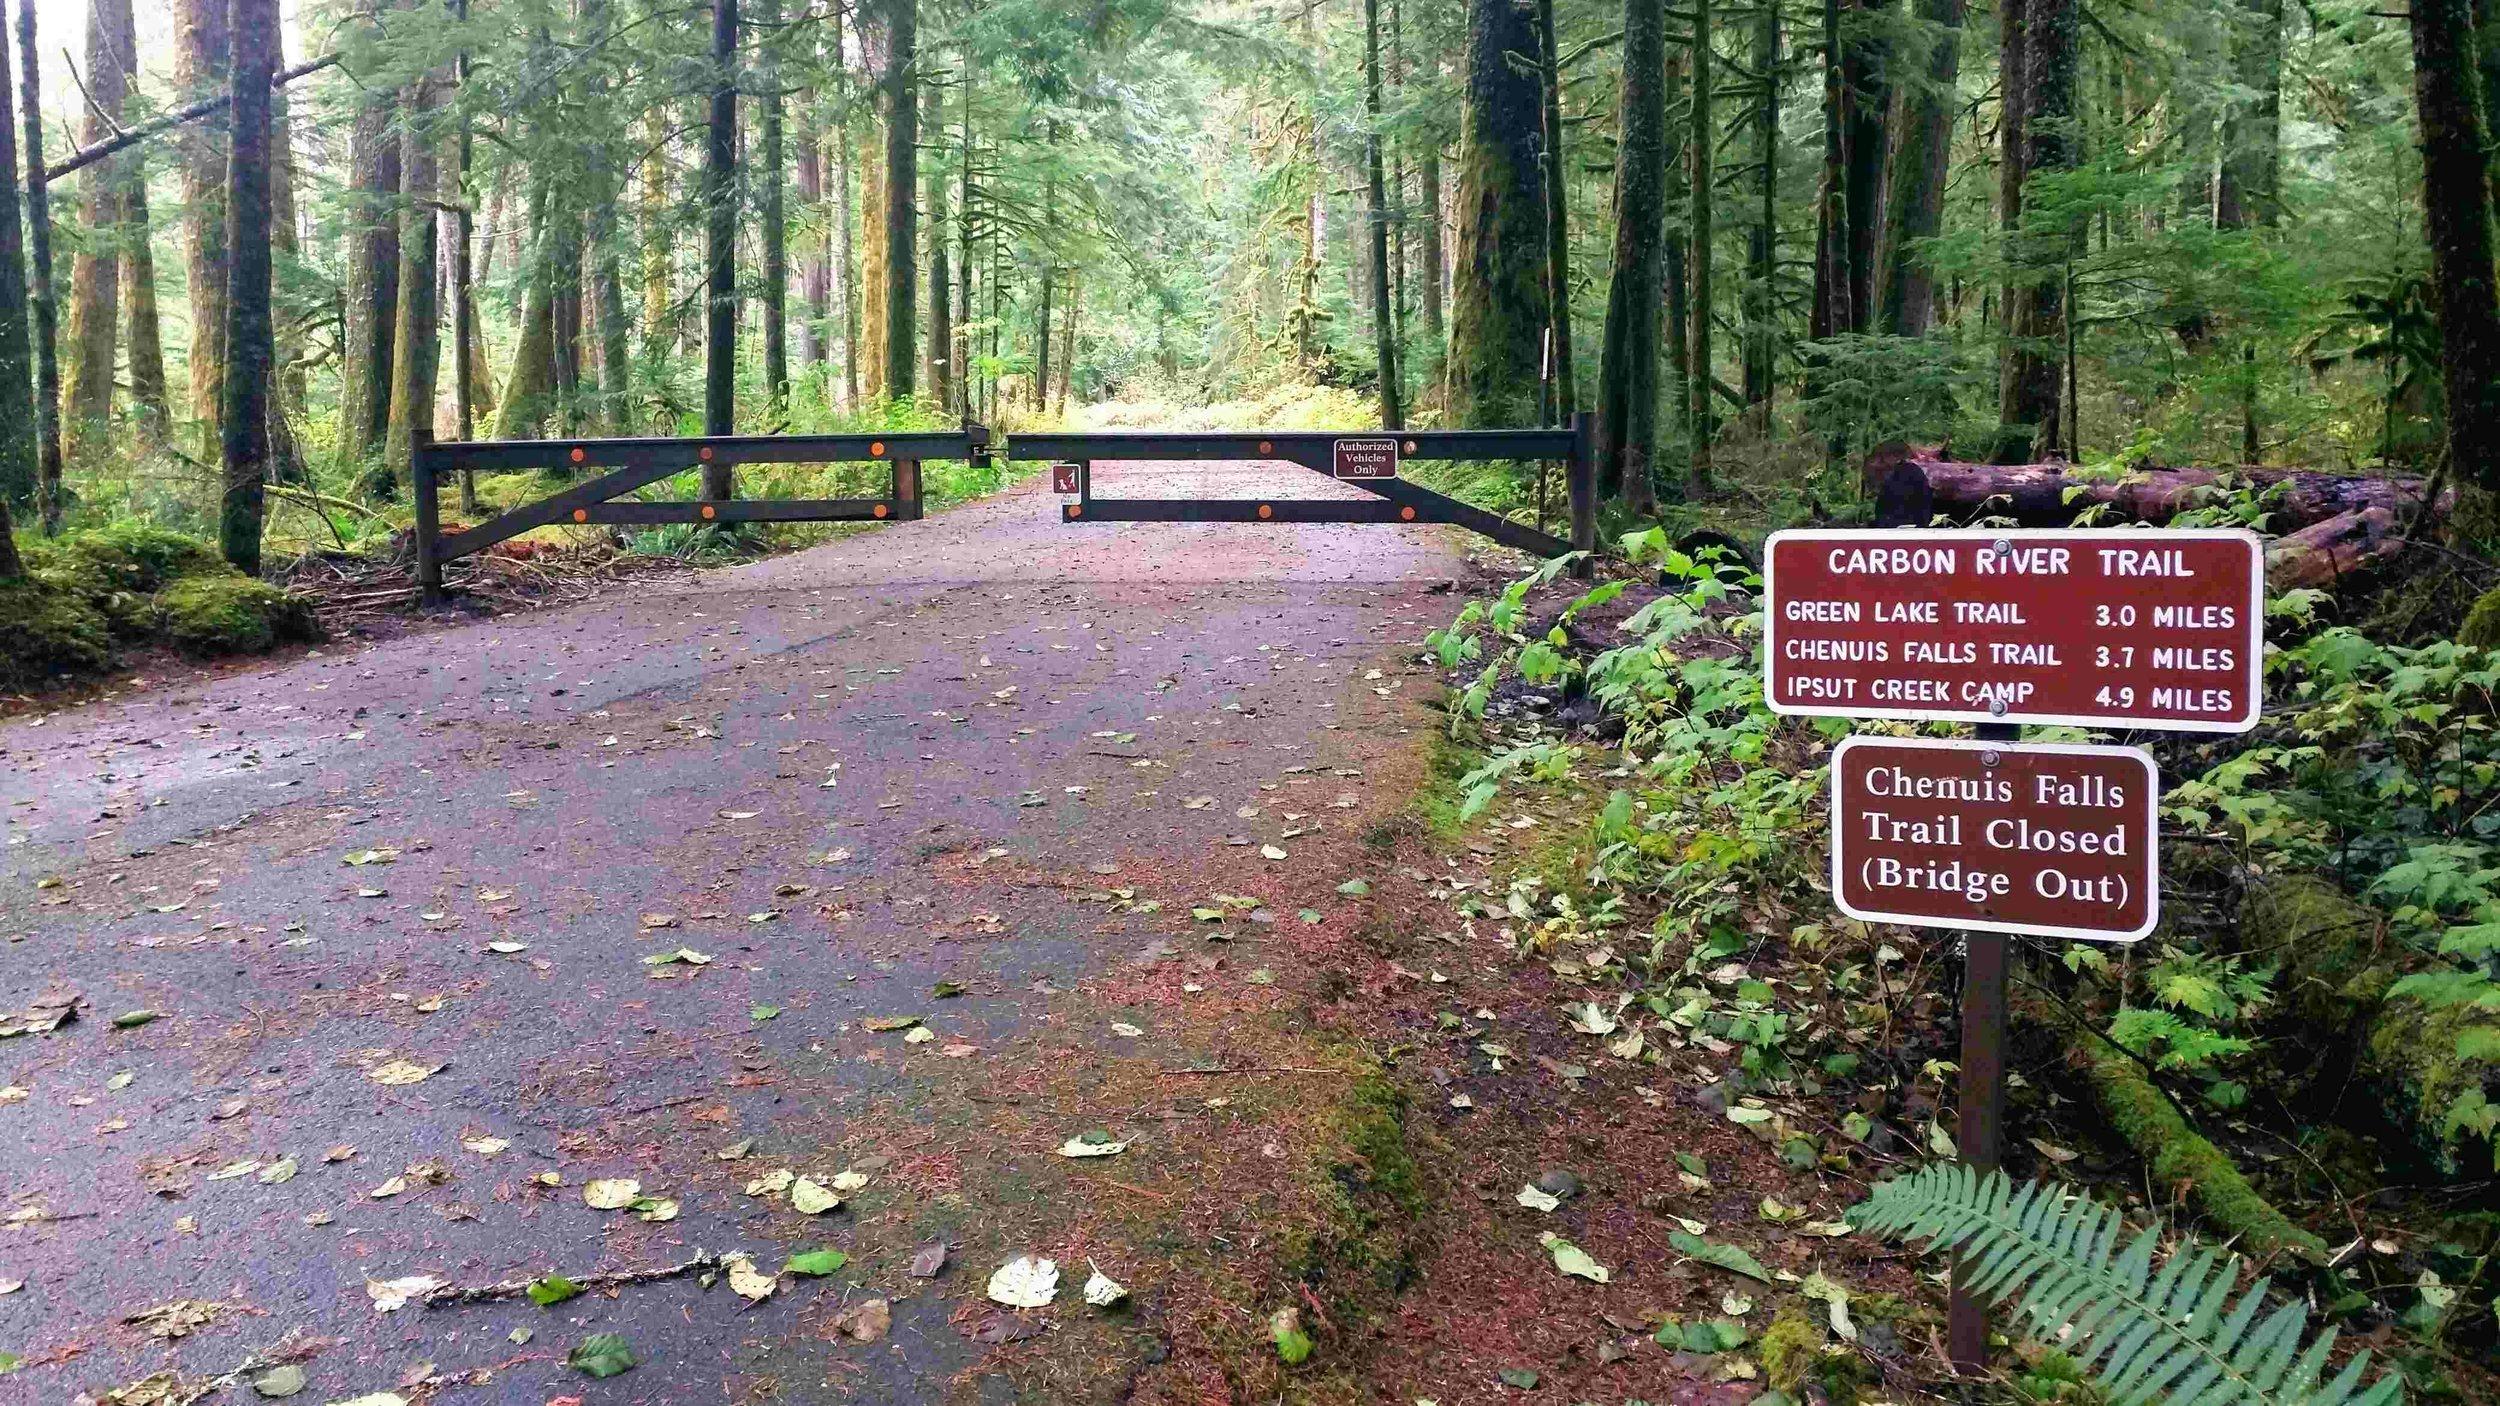 Carbon River Road in Mount Rainier National Park